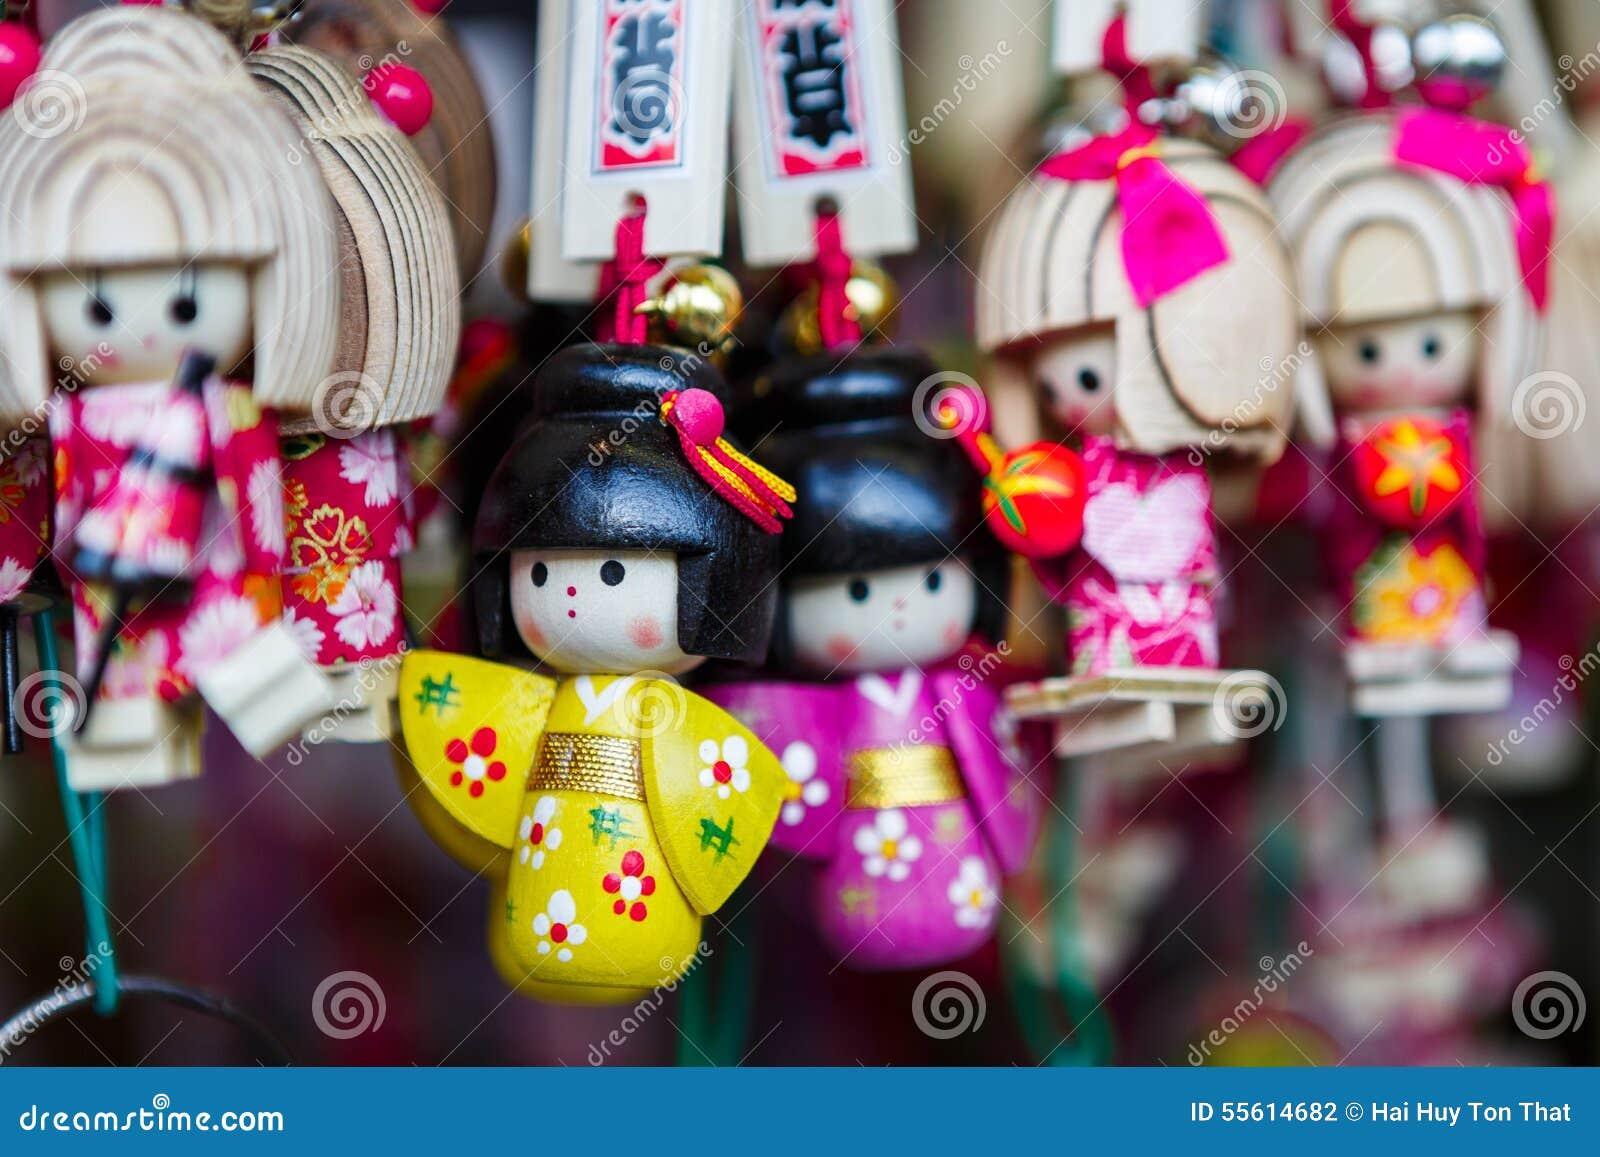 Japan souvenir keychain